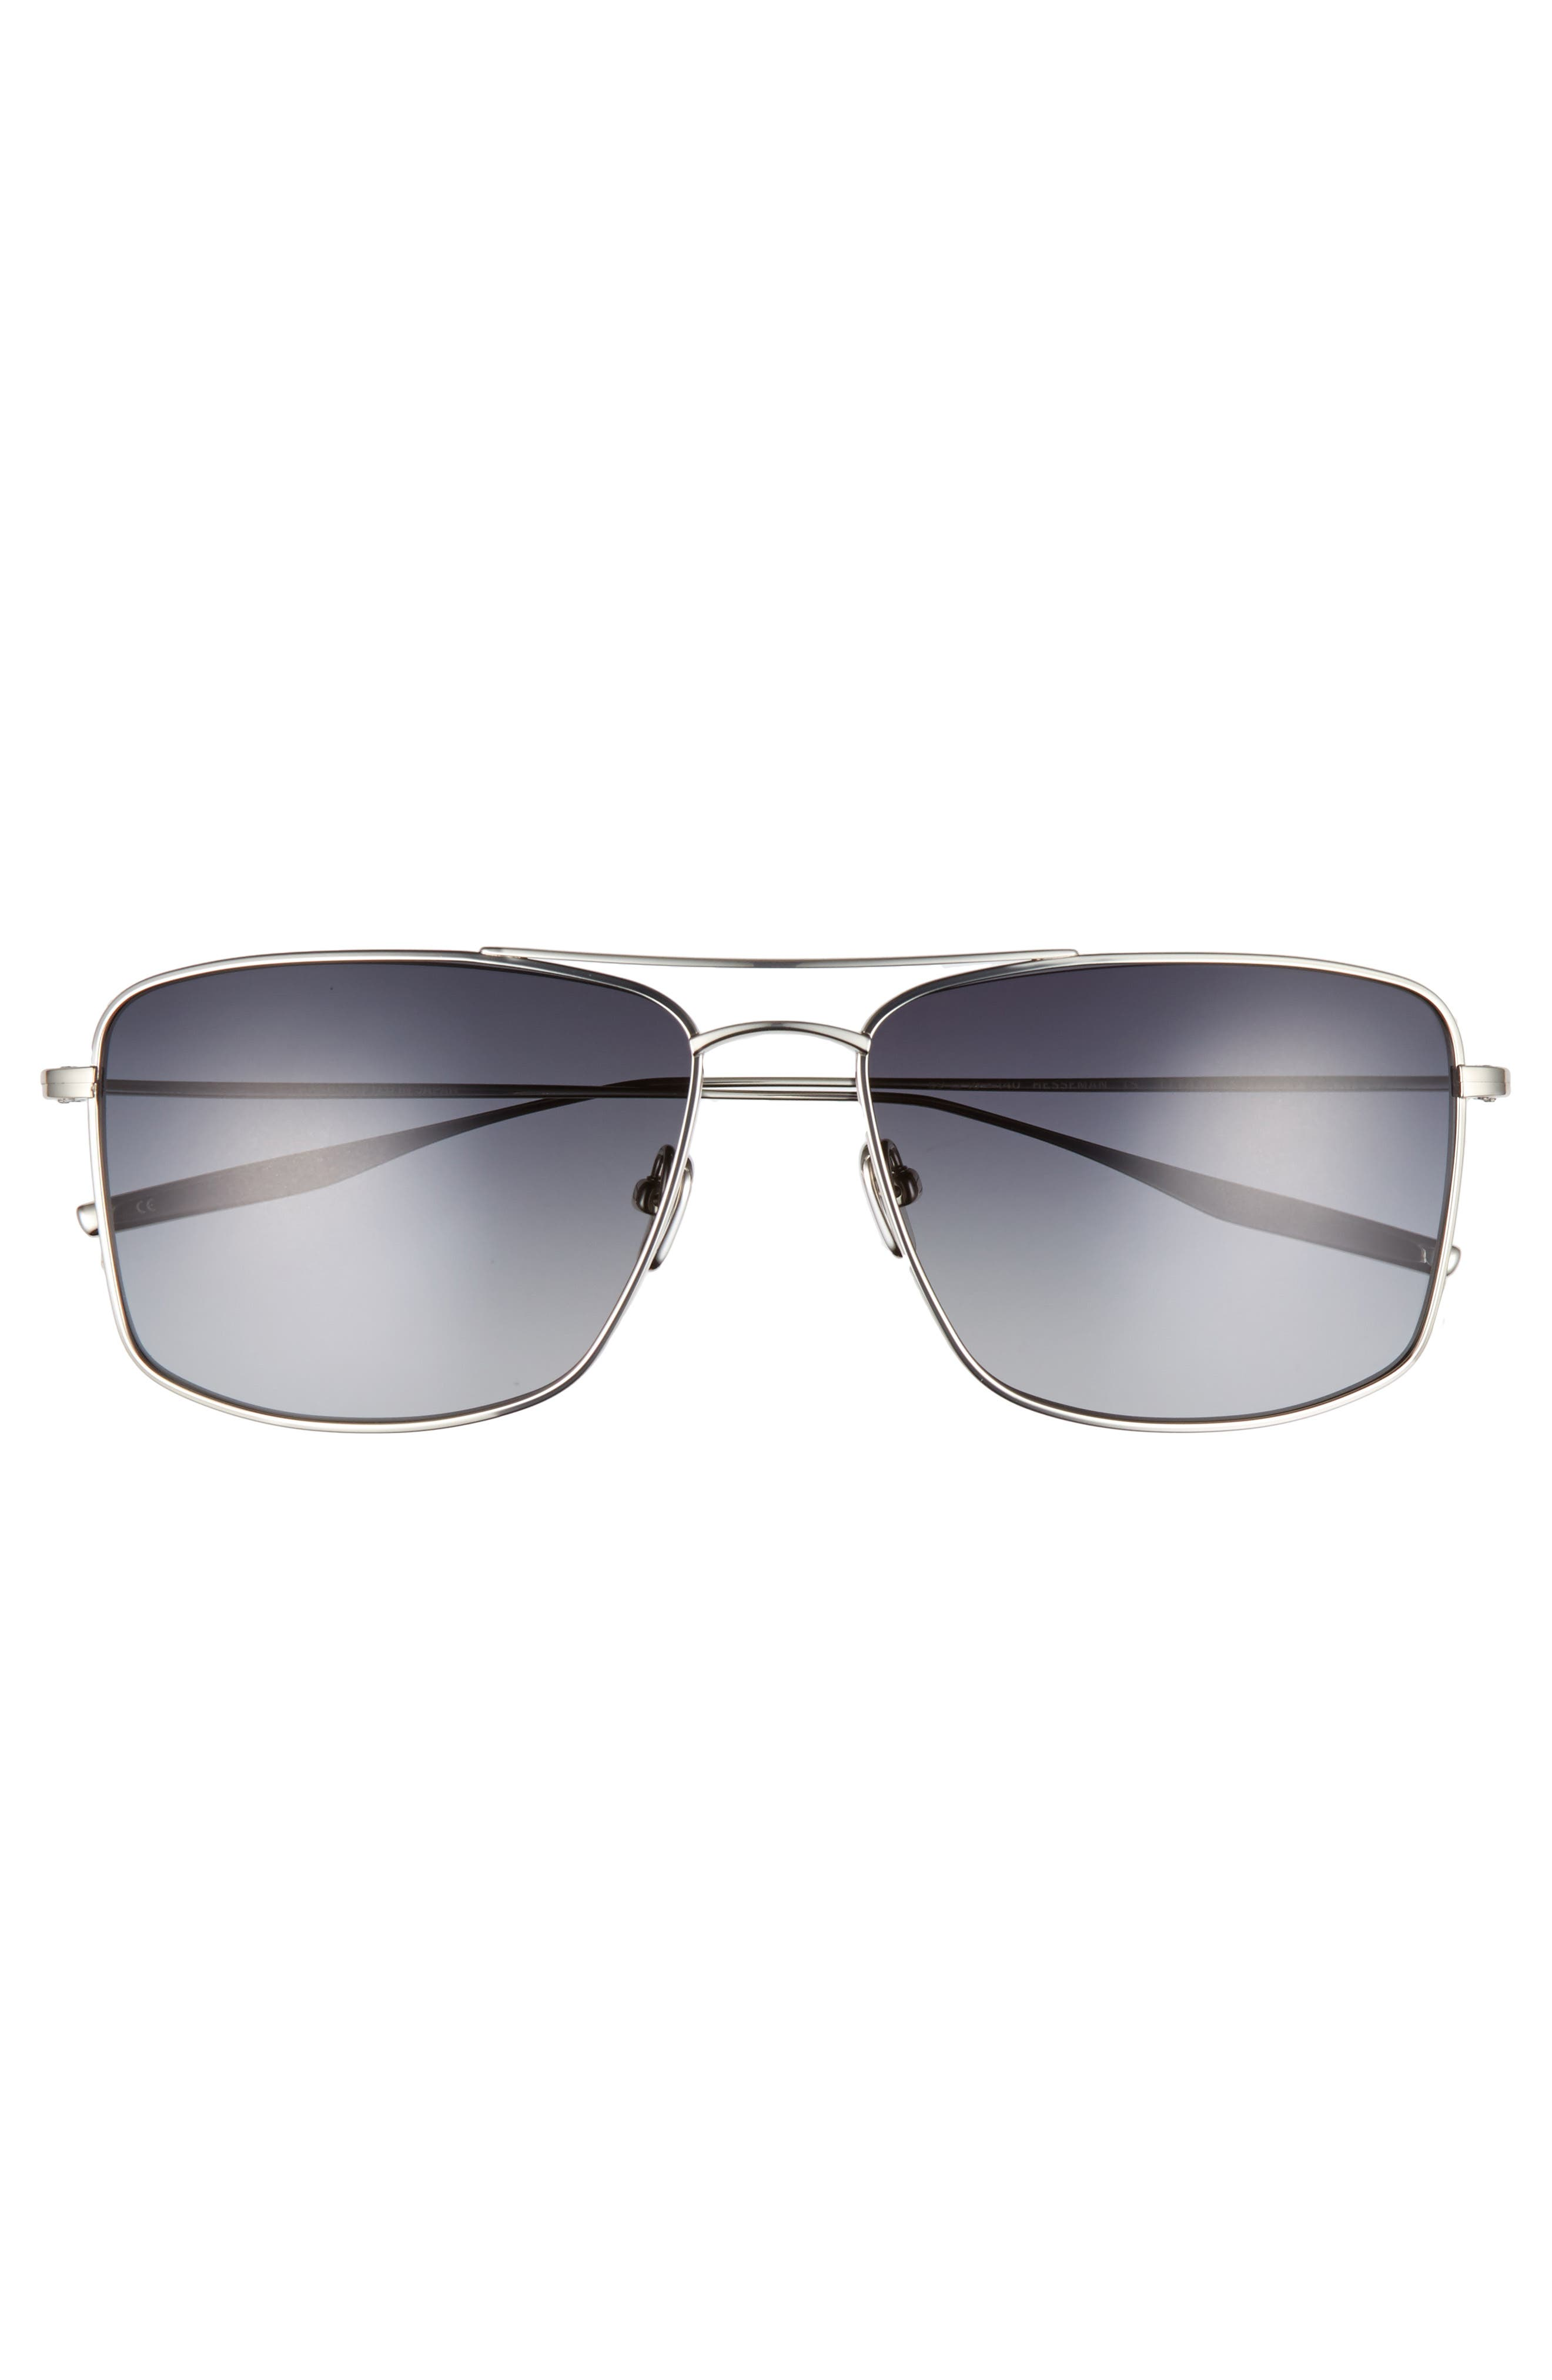 Hesseman 59mm Polarized Sunglasses,                             Alternate thumbnail 2, color,                             TRADITIONAL SILVER